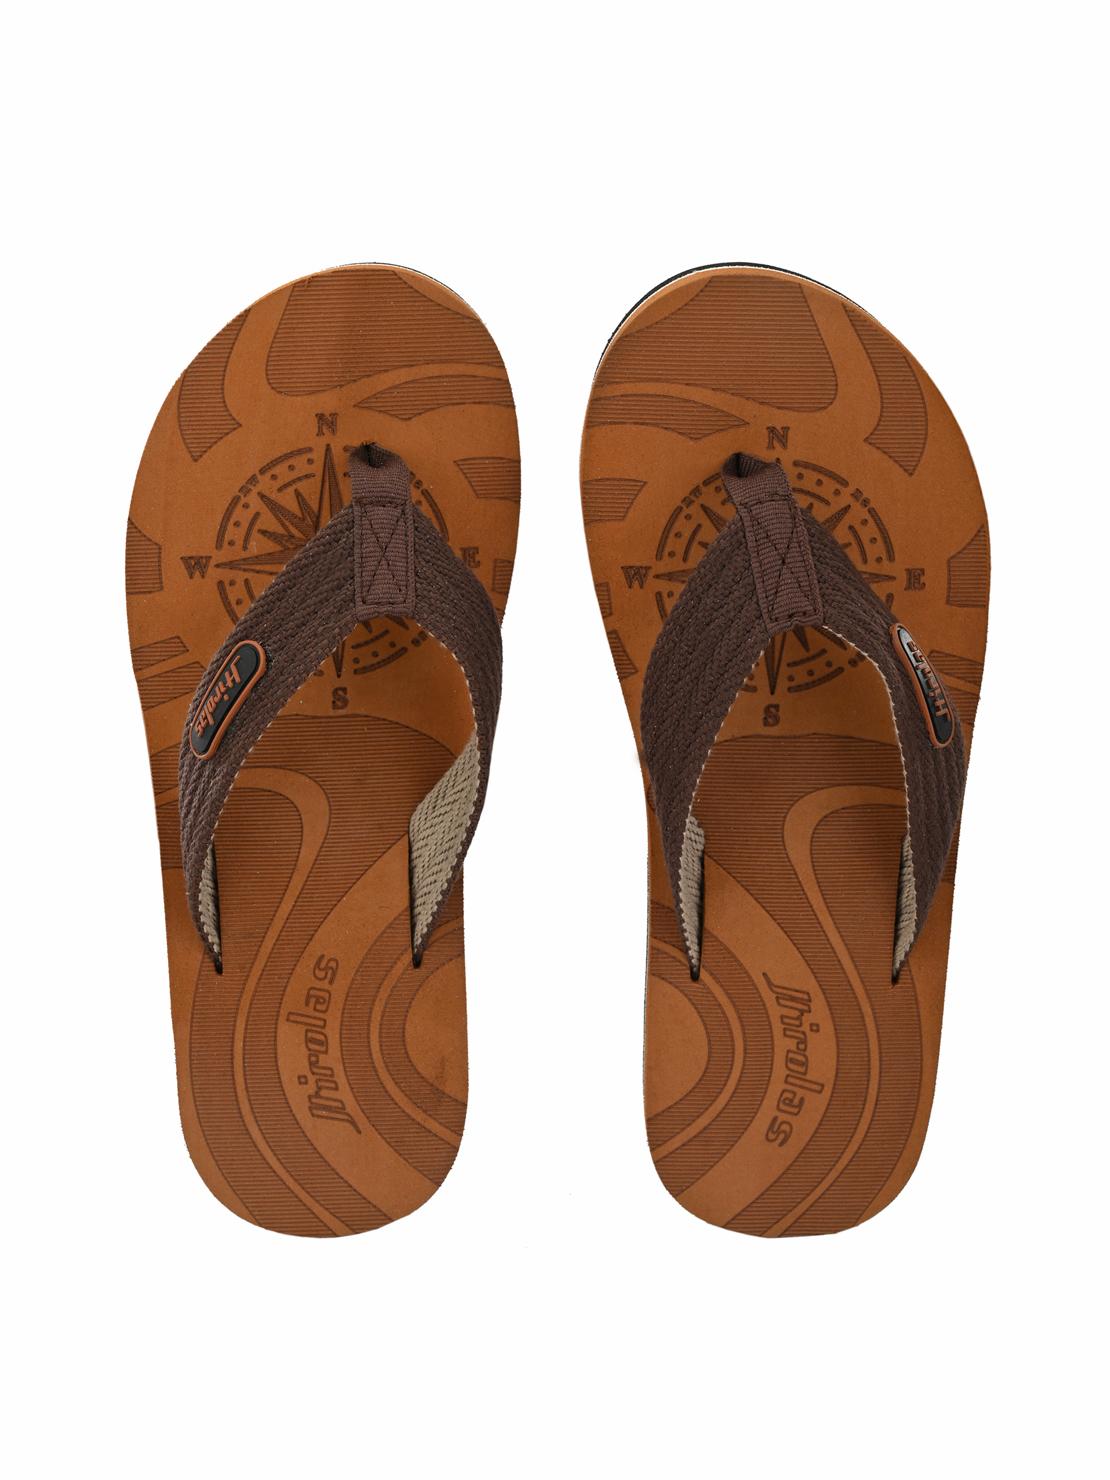 Hirolas | Hirolas Fabrication Laser design Flip-Flop Slippers - Tan